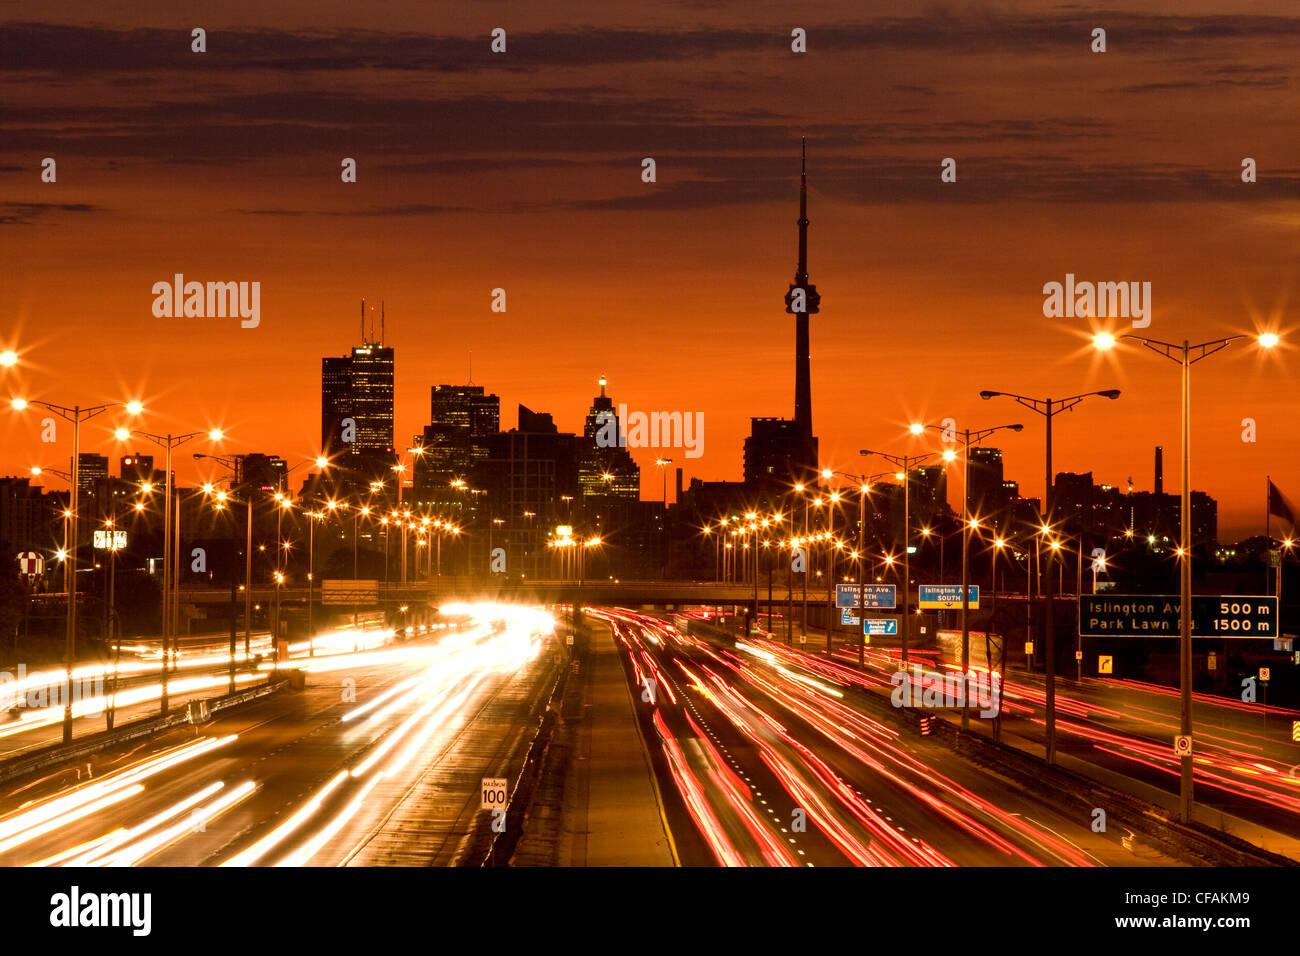 Toronto Skyline und QEW Autobahn mit Morgen Verkehrsaufkommen, Toronto, Ontario, Kanada. Stockbild